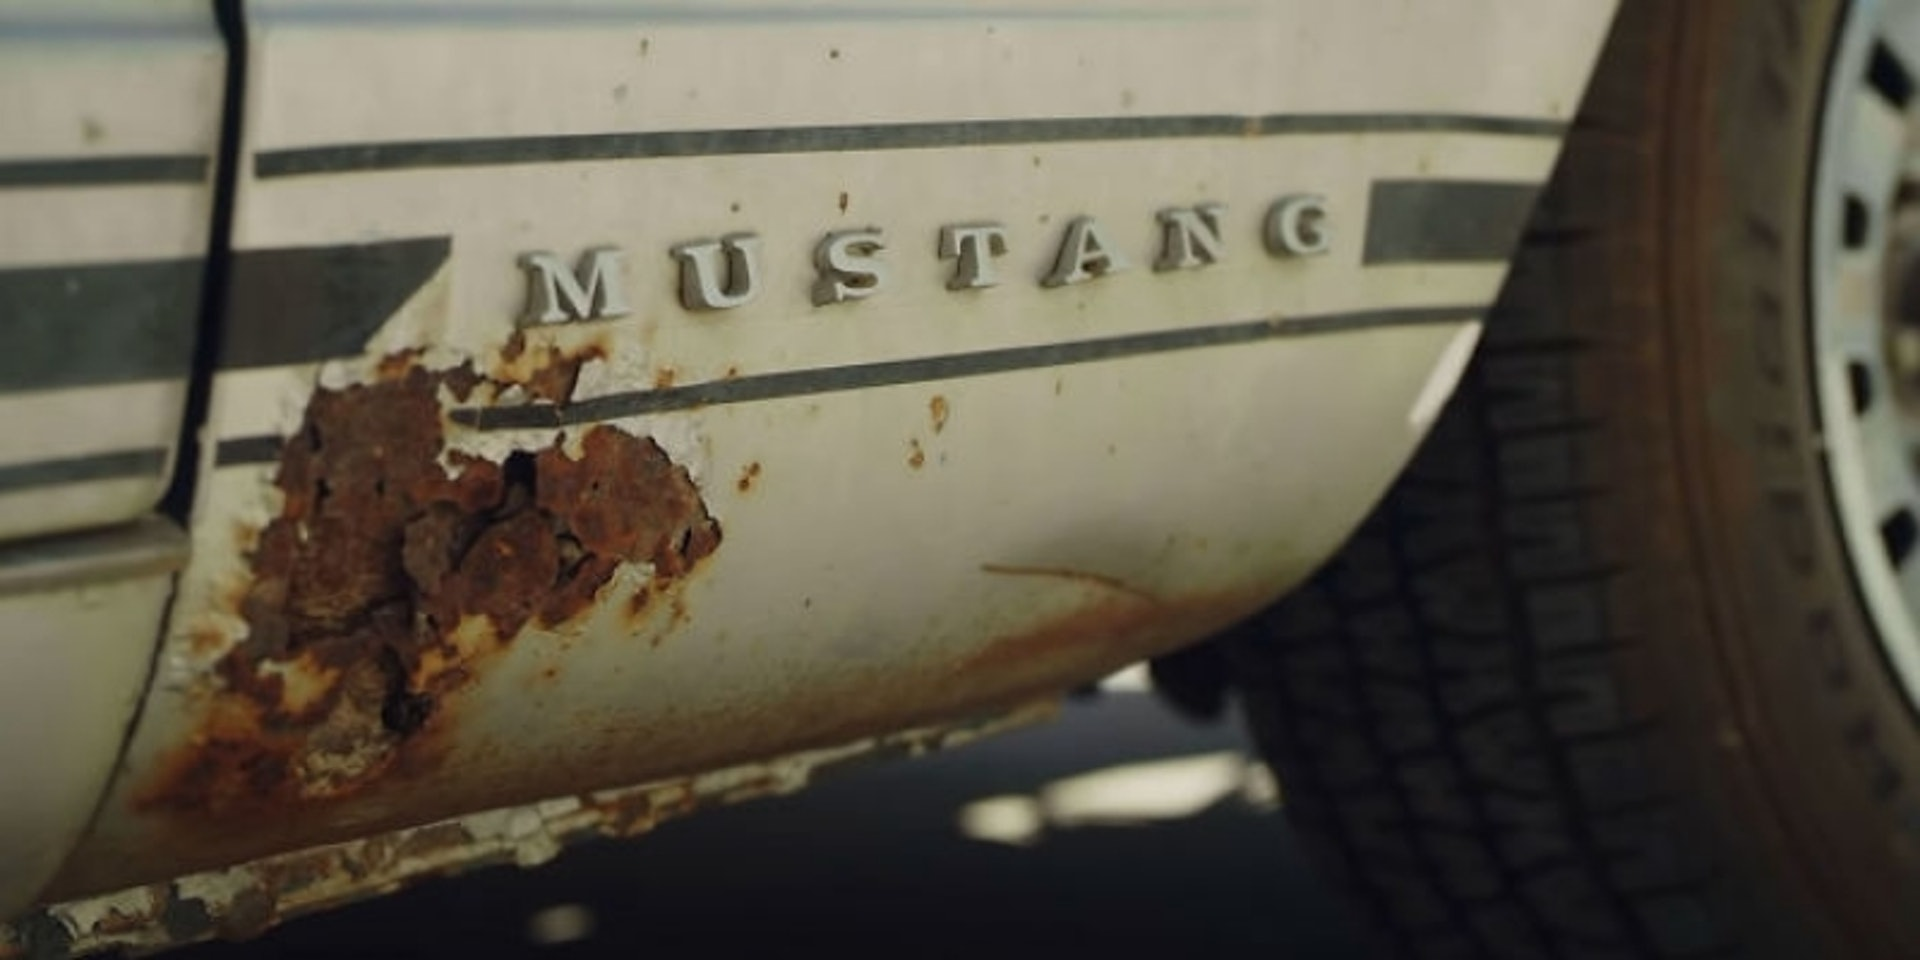 Lisa Bonet人生中第一部車是1965年「Ford Mustang」,愛車對她很有紀念價值。(影片截圖)